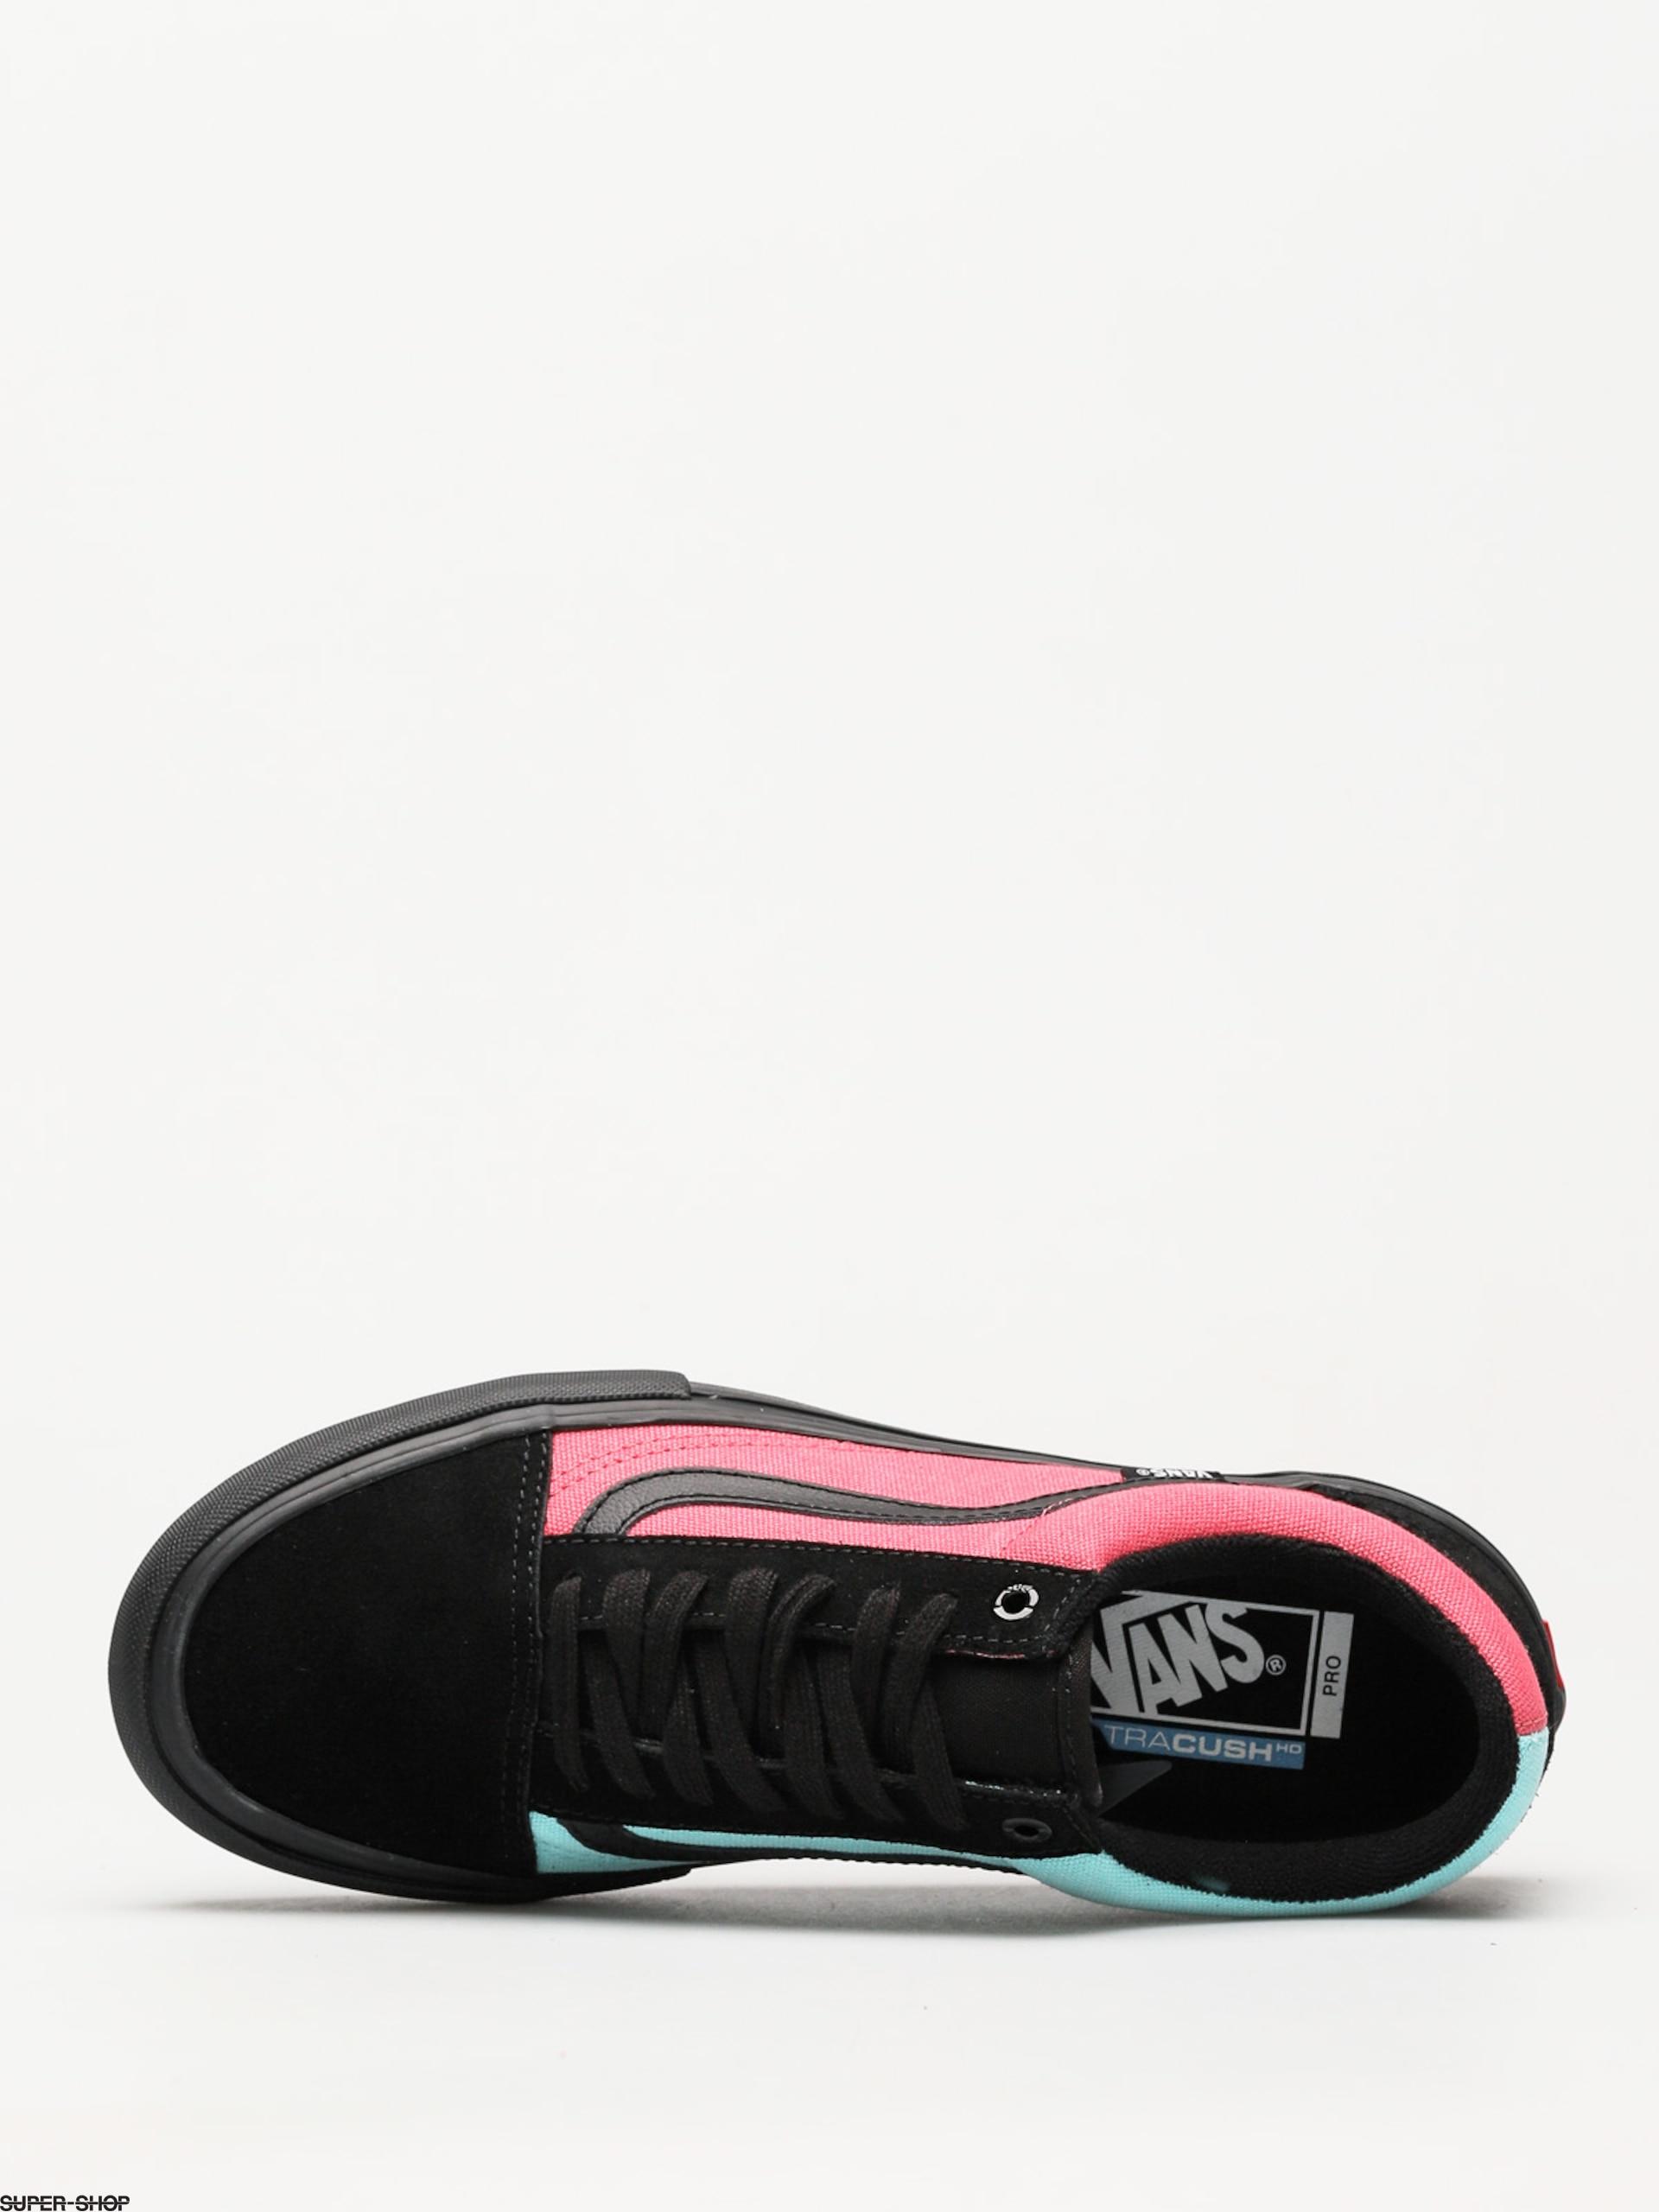 5bf237cac4b6 Vans Shoes Old Skool Pro (asymmetry black rose blue)